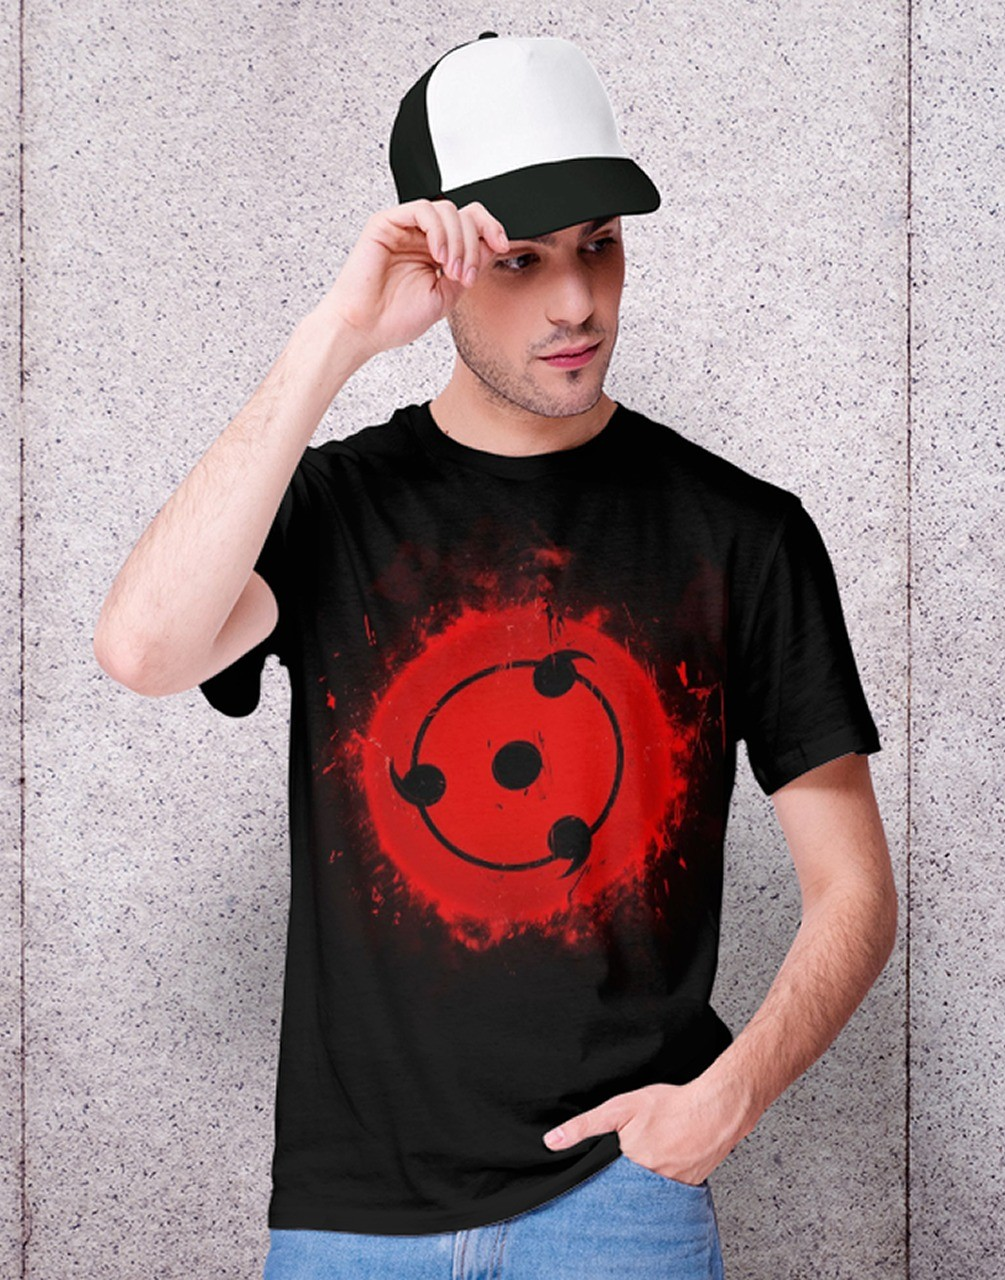 Camiseta Unissex Sharingan Família Uchiha: Naruto Shippuden (Preta) - EV -  Anime Mangá